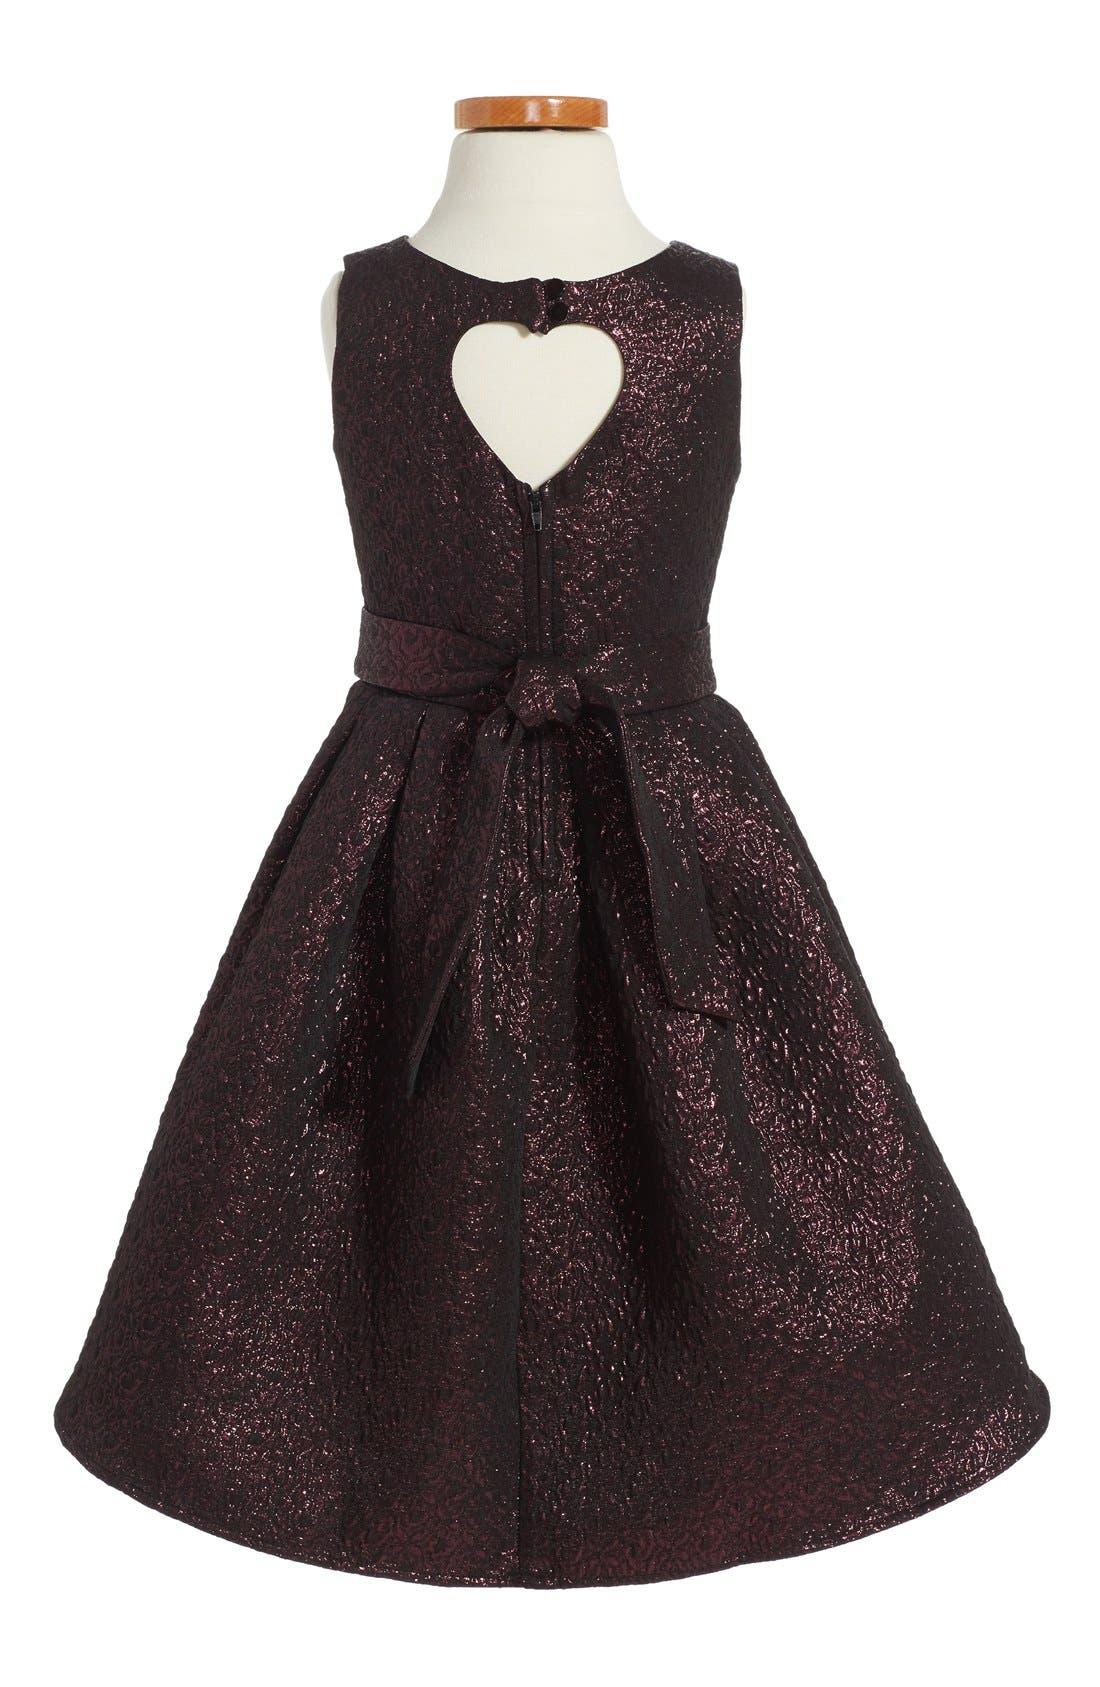 Alternate Image 2  - Zunie Brocade Fit & Flare Dress (Toddler Girls, Little Girls & Big Girls)